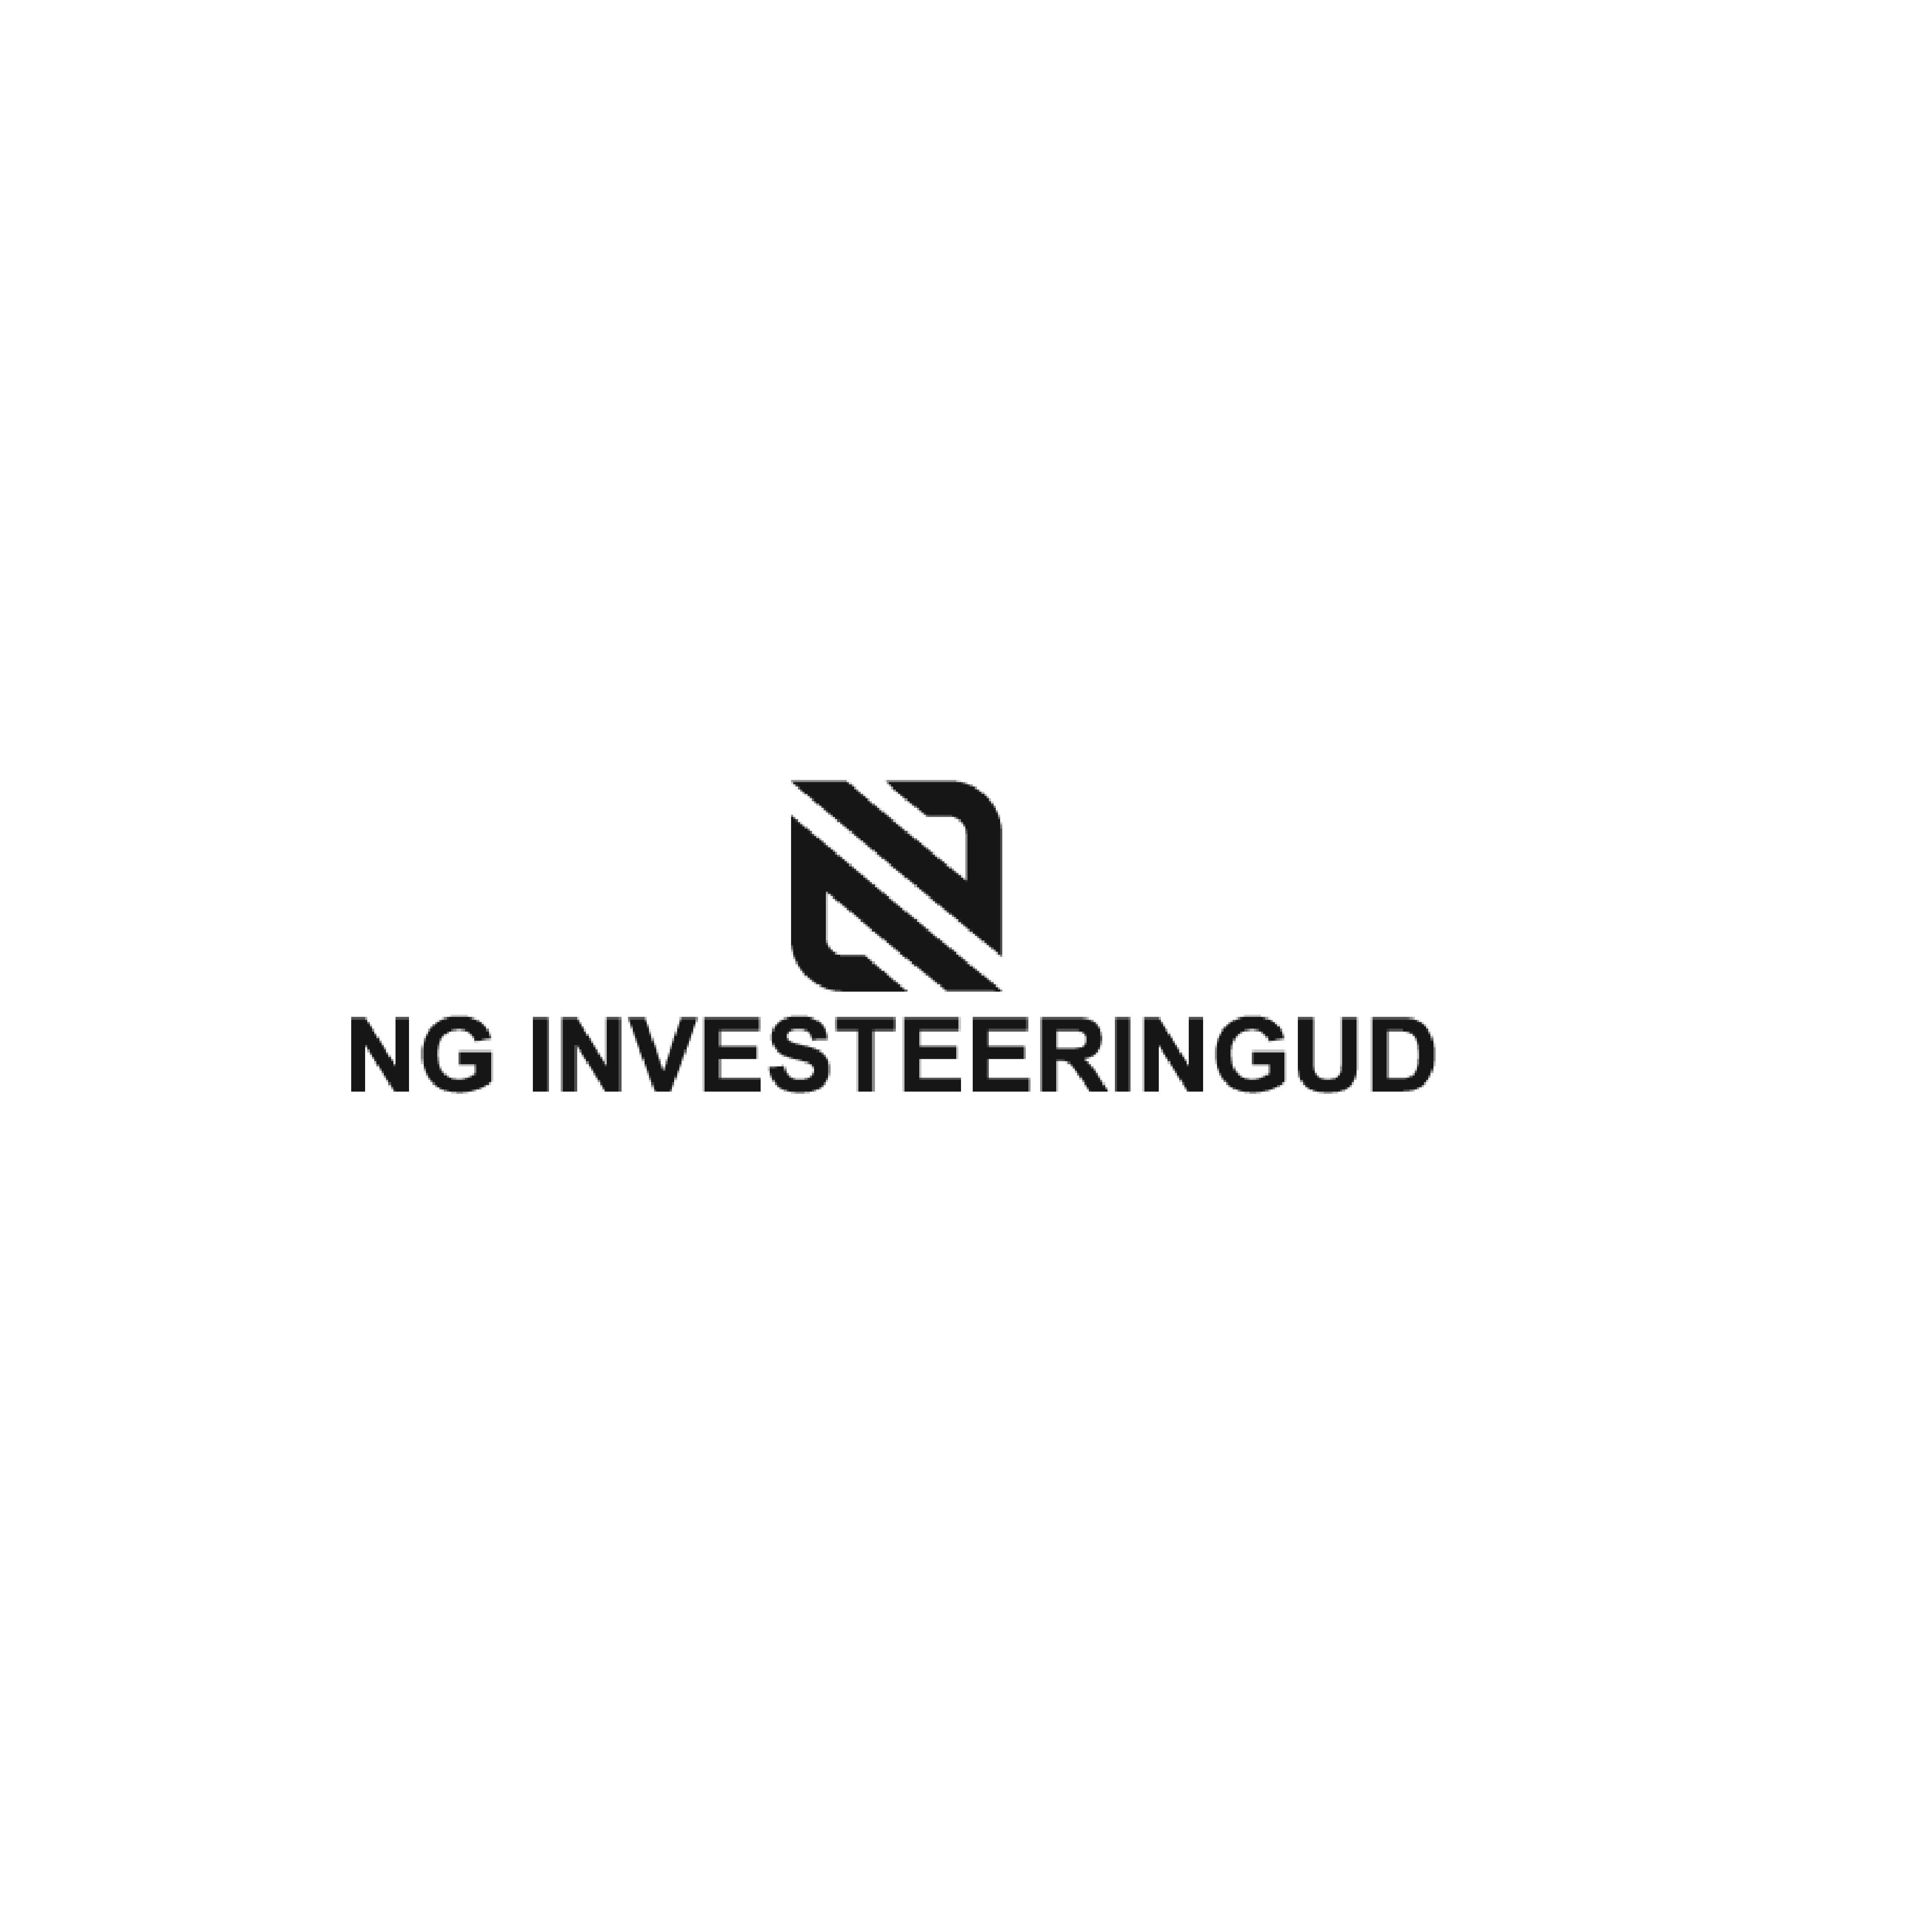 NG Investeeringud OÜ